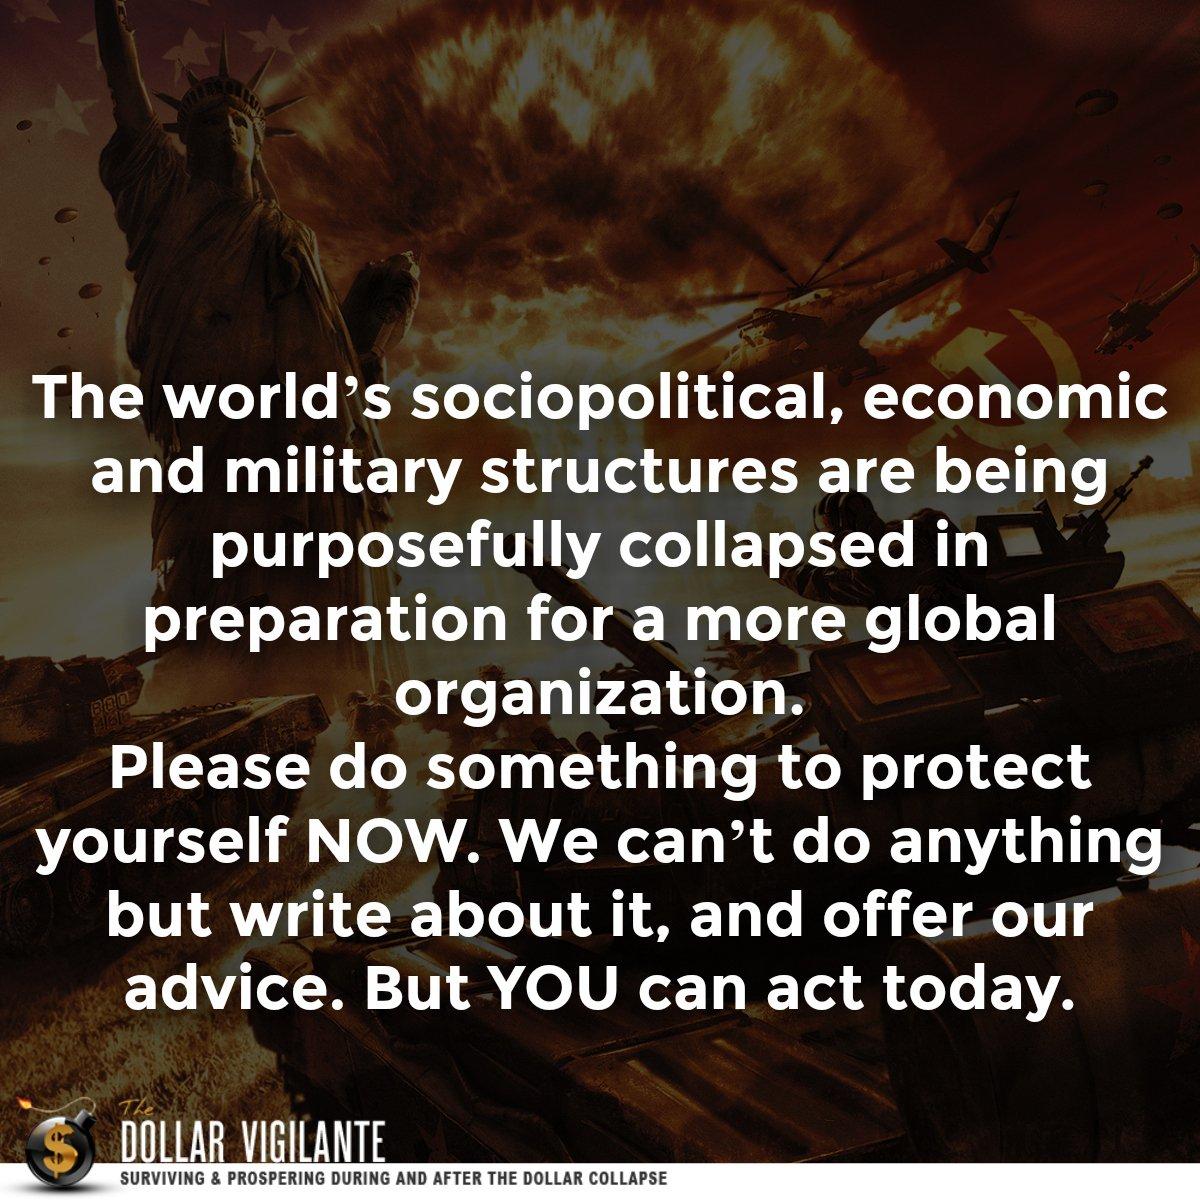 Join us--&gt;  https:// dollarvigilante.com/2tt  &nbsp;   #Economy #Politics #Investing<br>http://pic.twitter.com/7berRExYHy